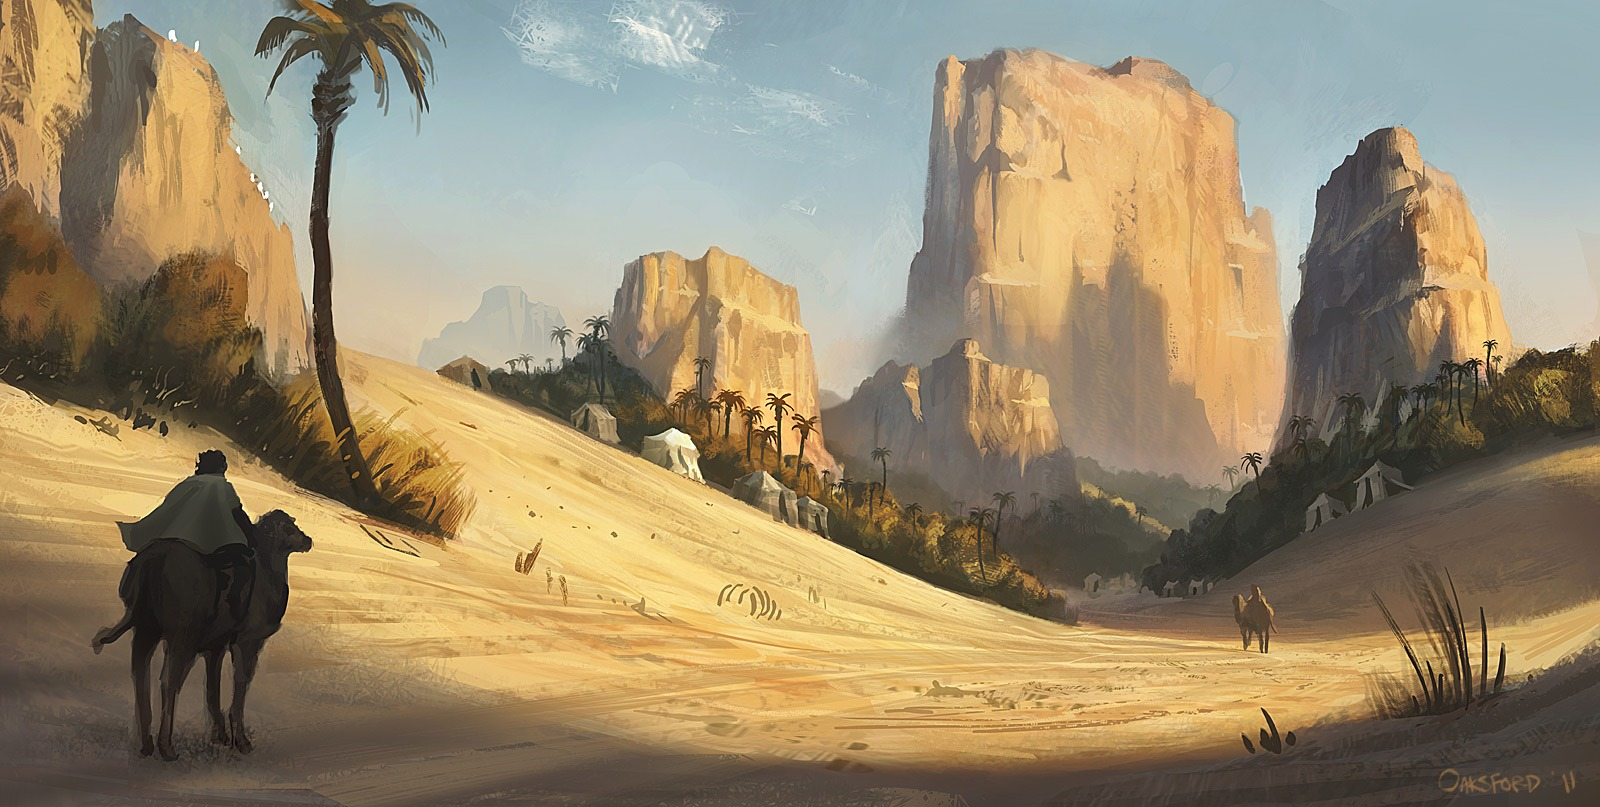 Khinasi oasi